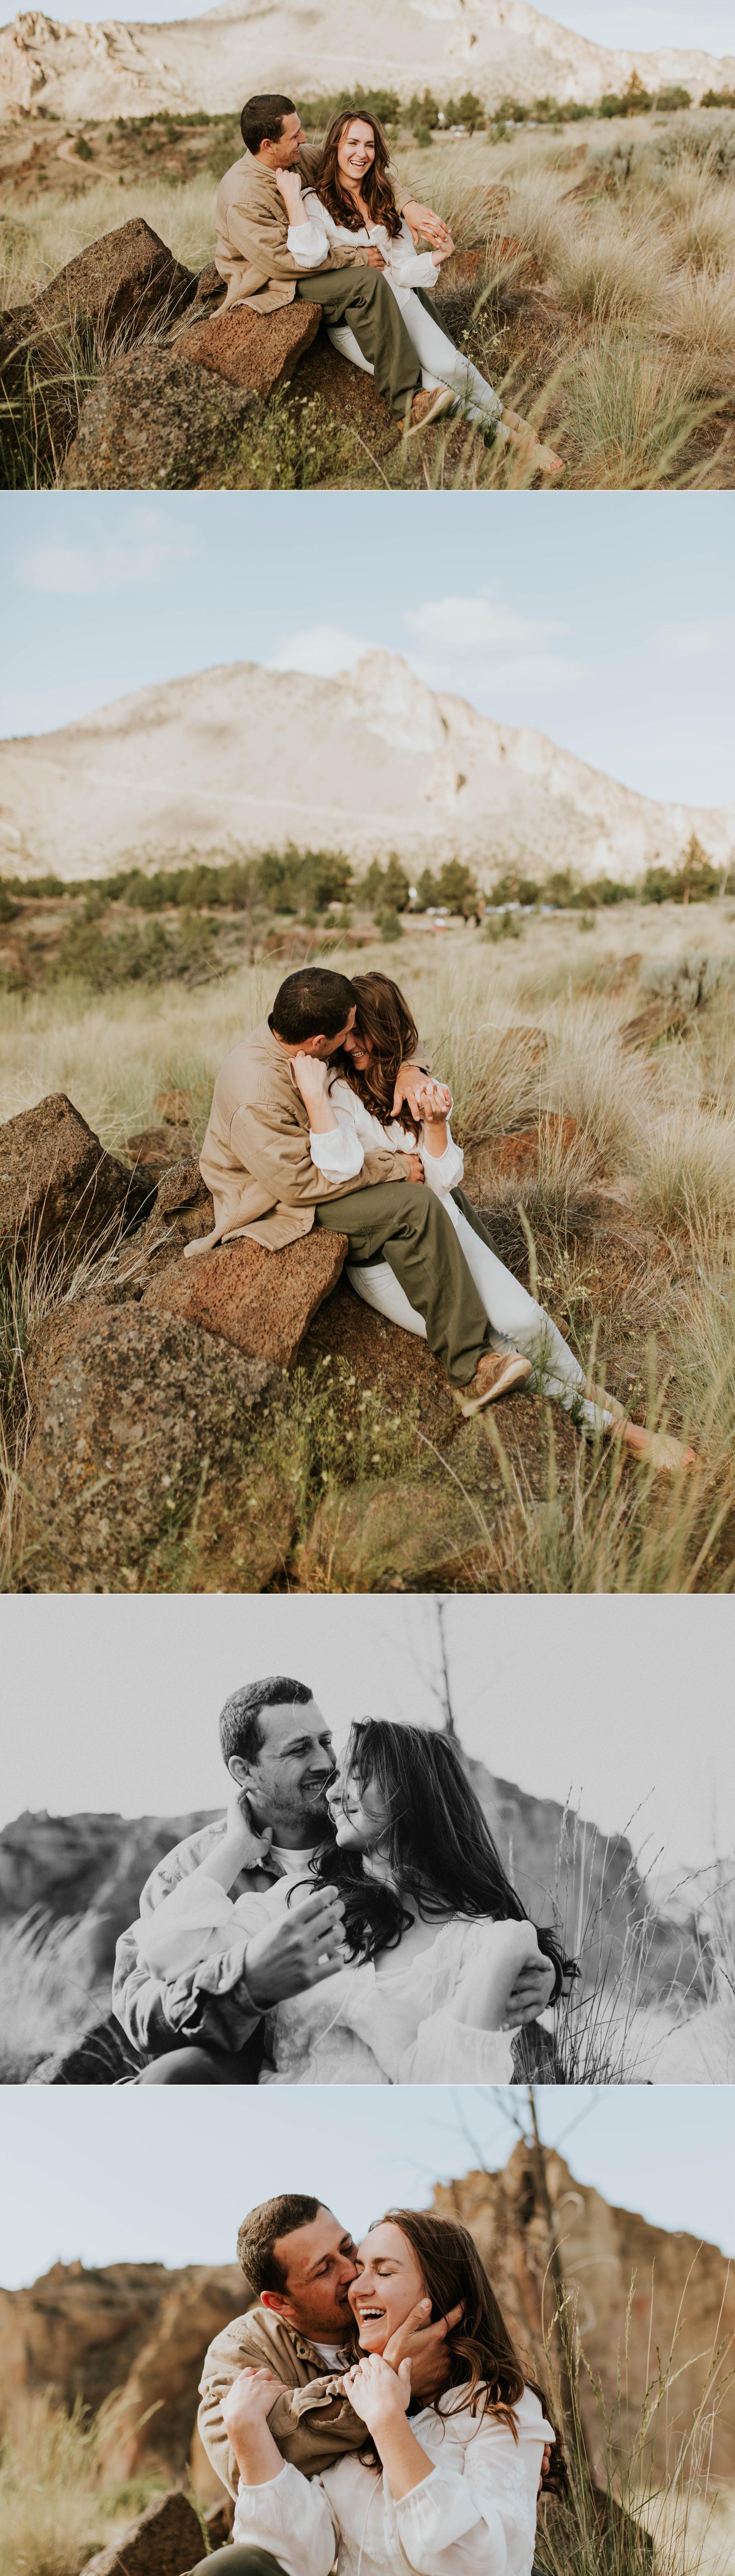 ThroughVictoriasLens_SmithRock_Engagements10.jpg